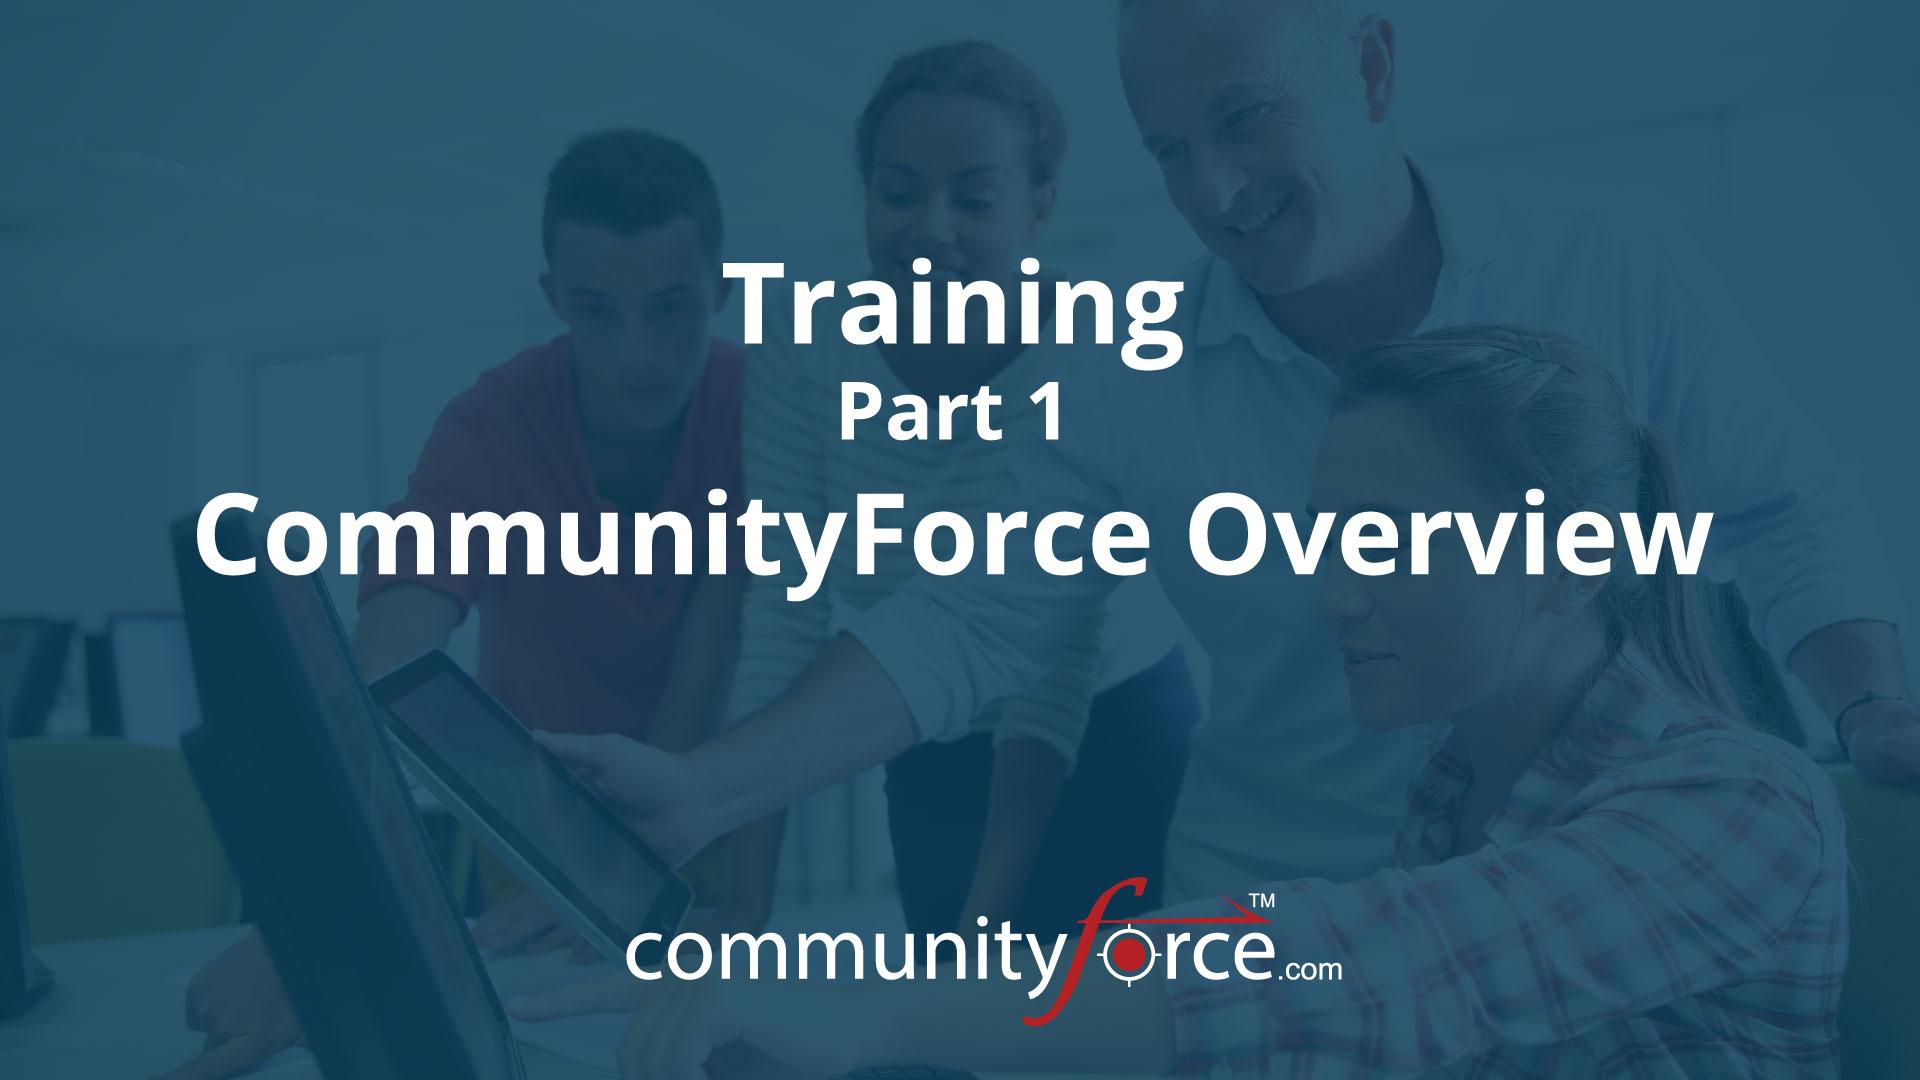 LF1 Training Part 1: CommunityForce Overview